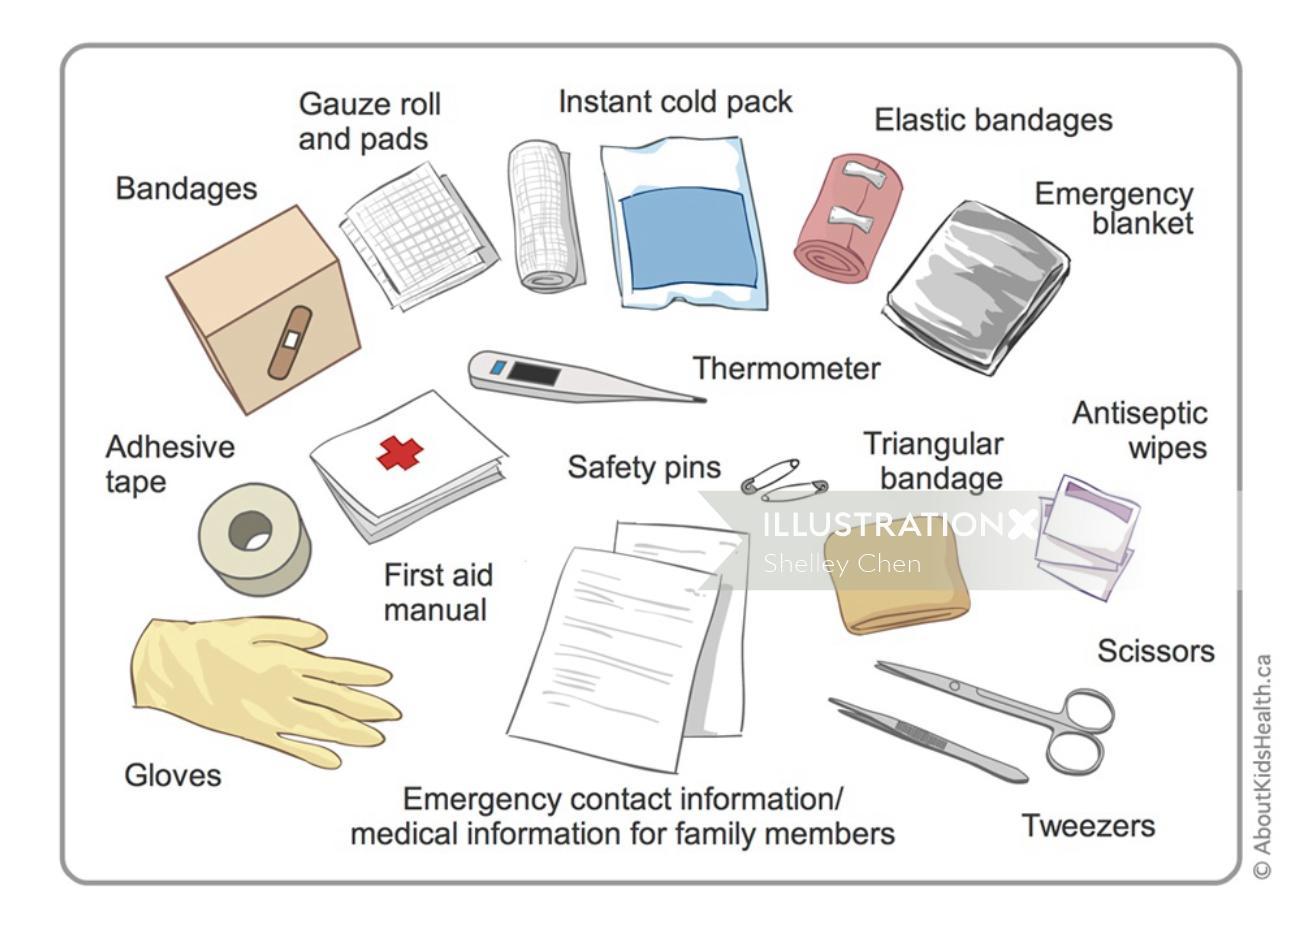 First Aid Kit illustration by Shelley Li Wen Chen